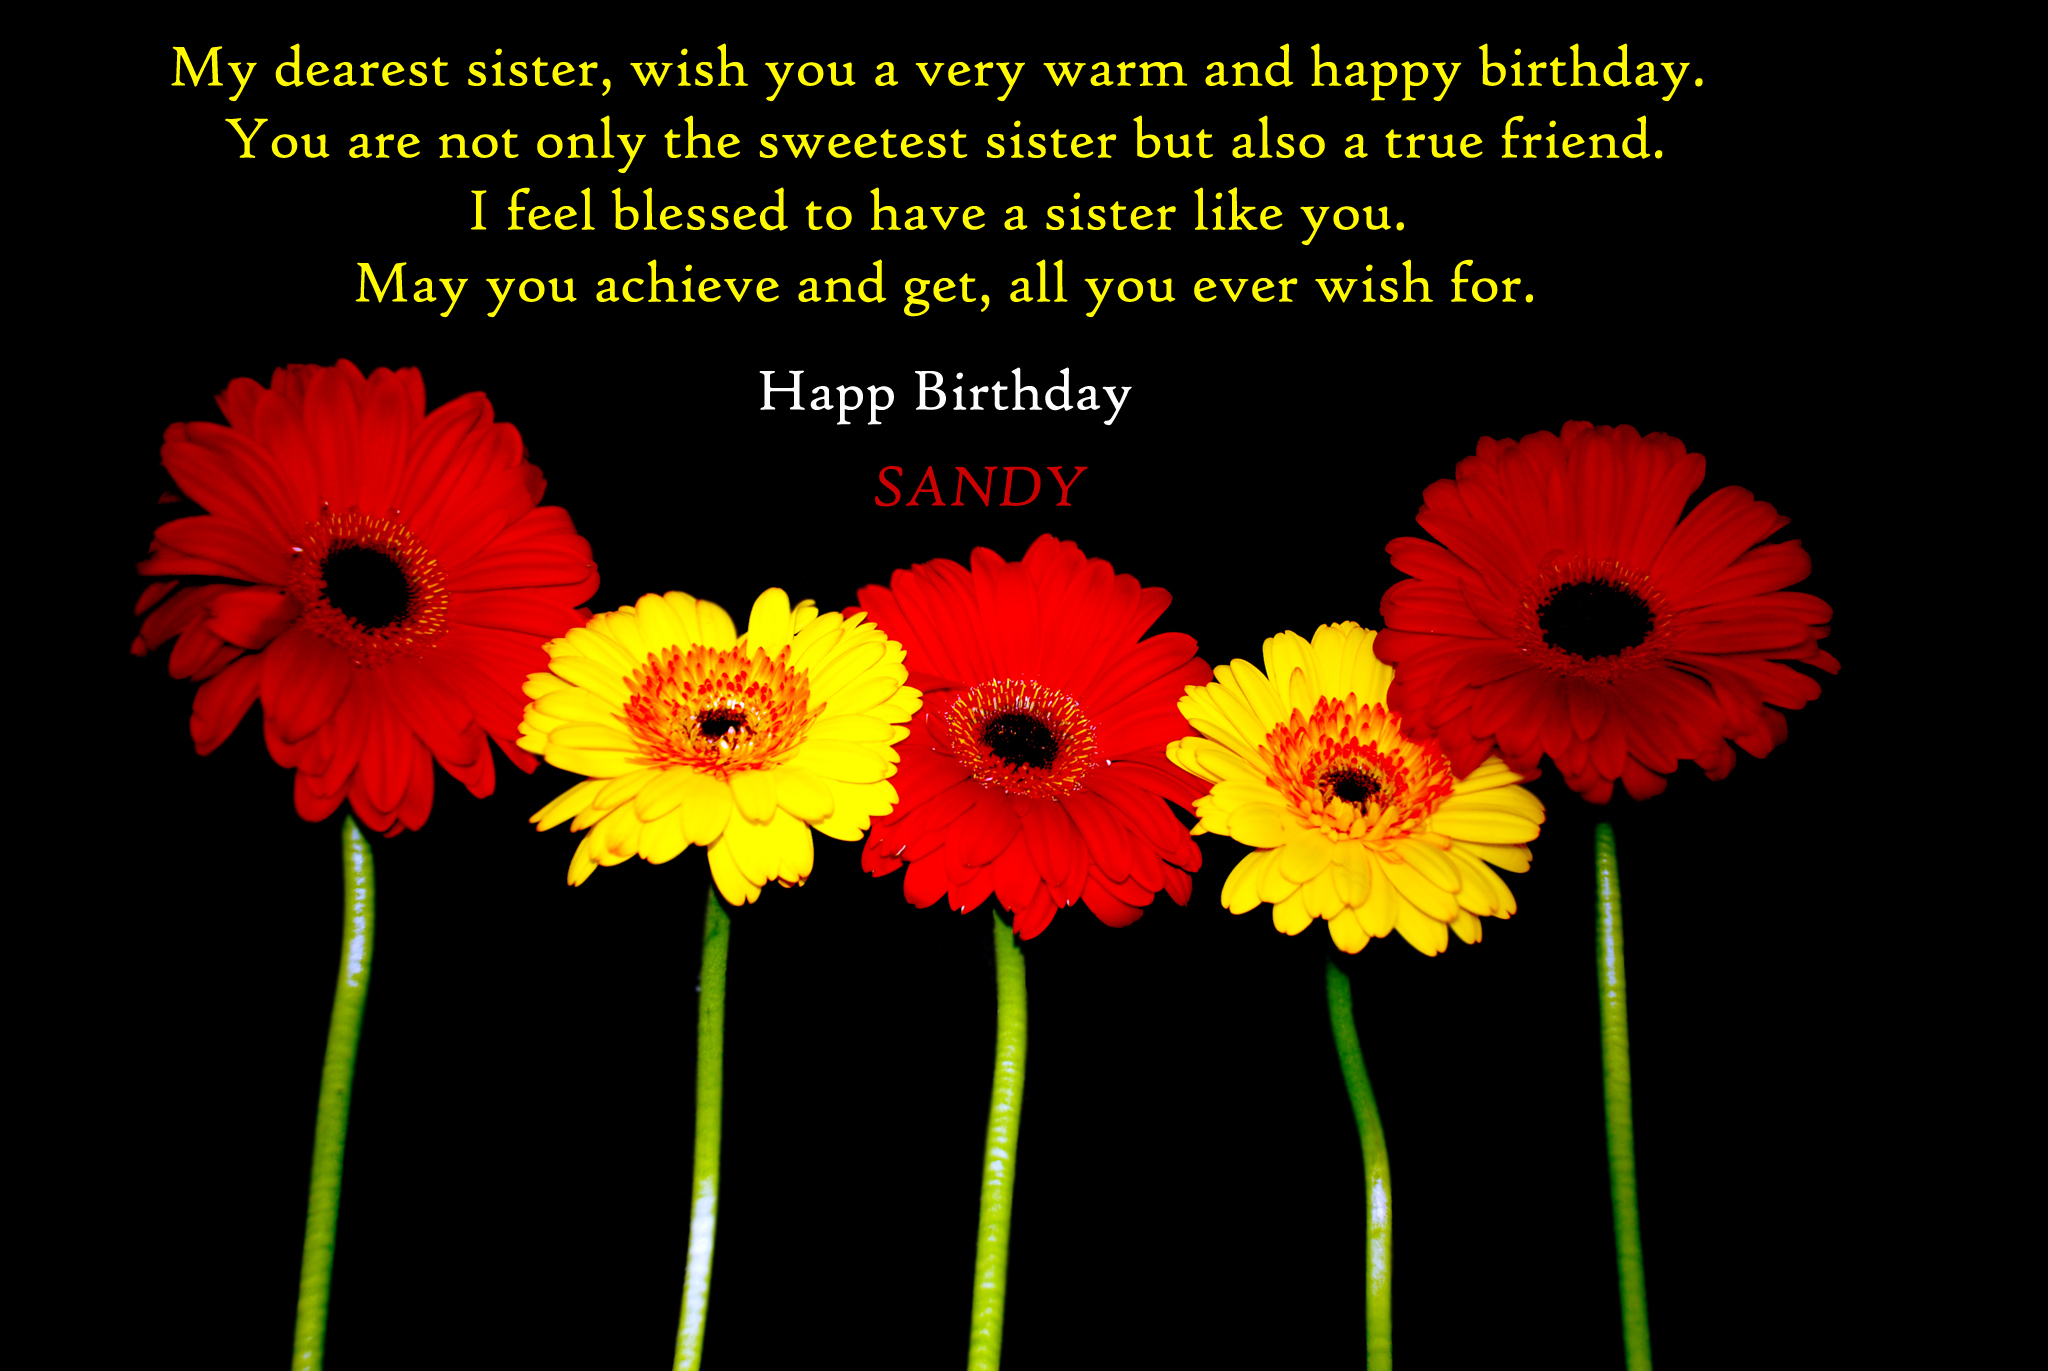 Happy Birthday Sandy By Hiaamir On Deviantart